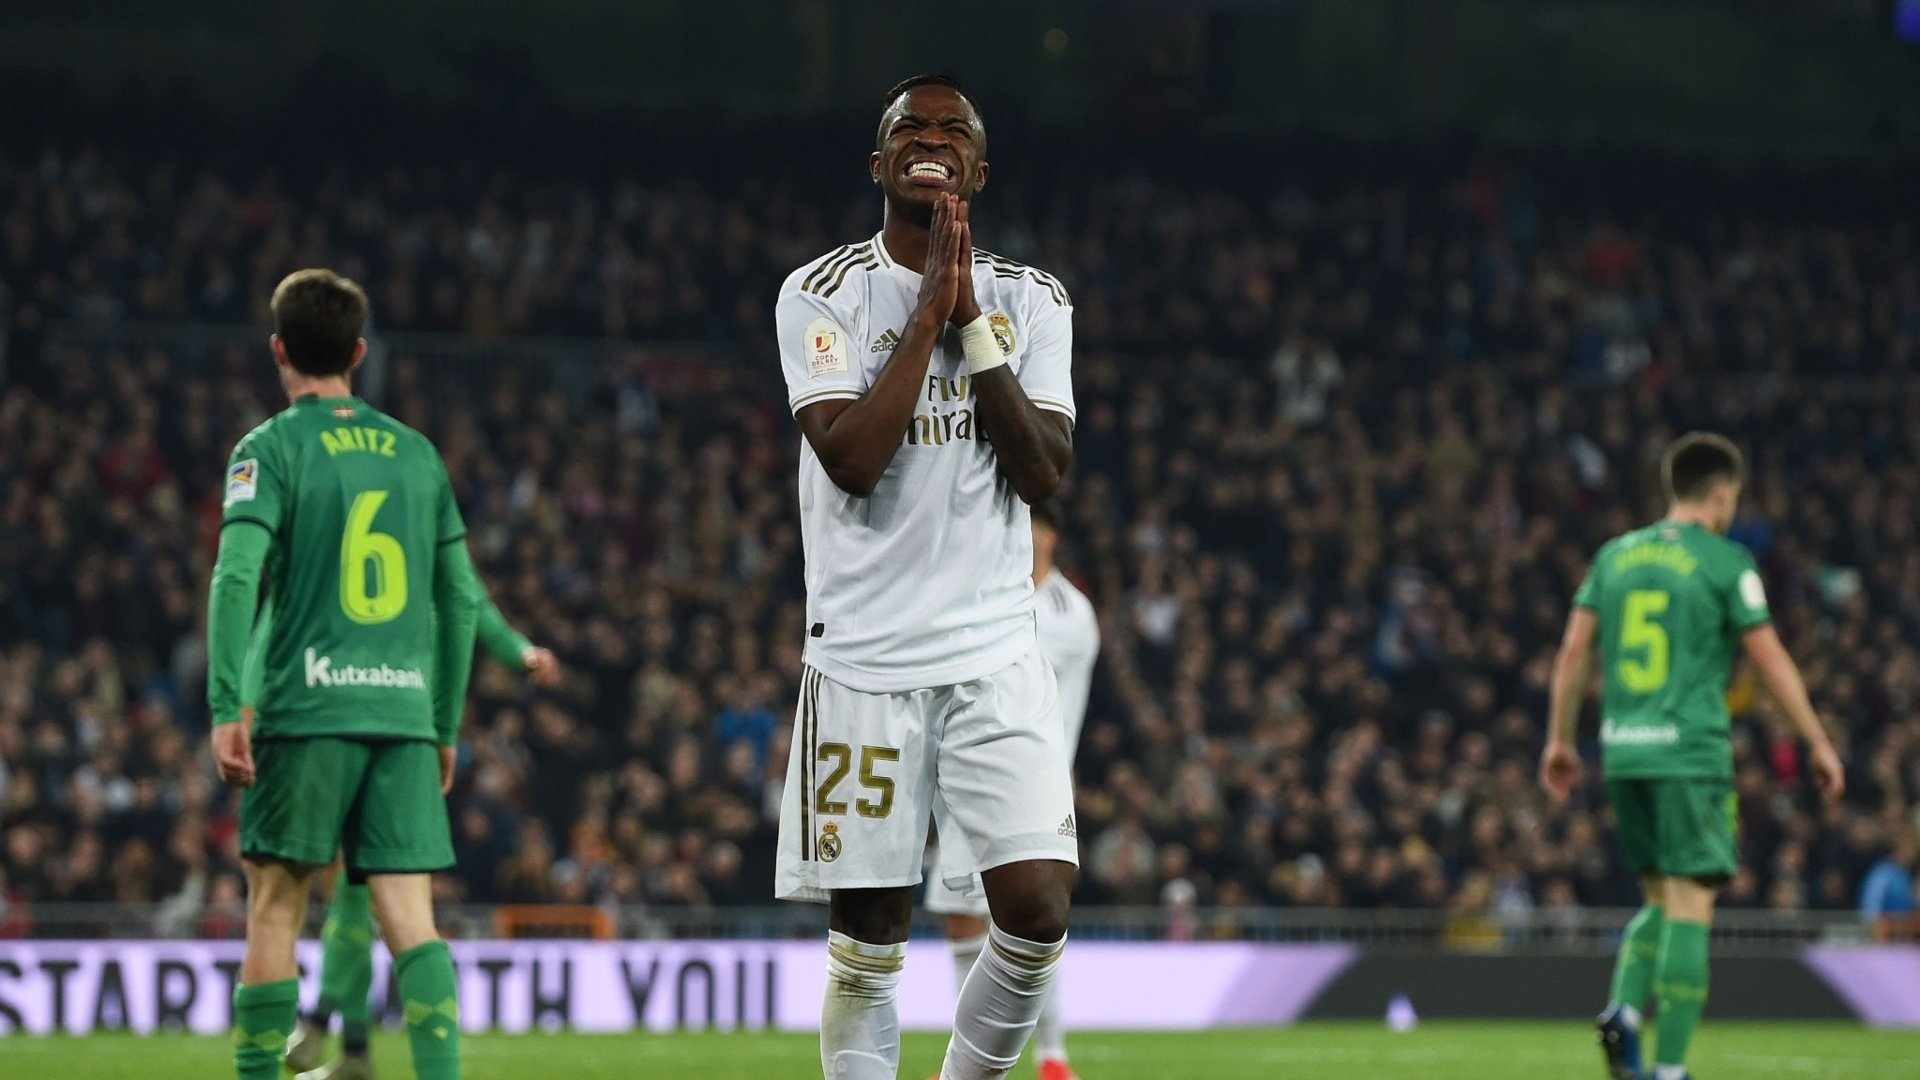 Report: Real Madrid 3-4 Real Sociedad